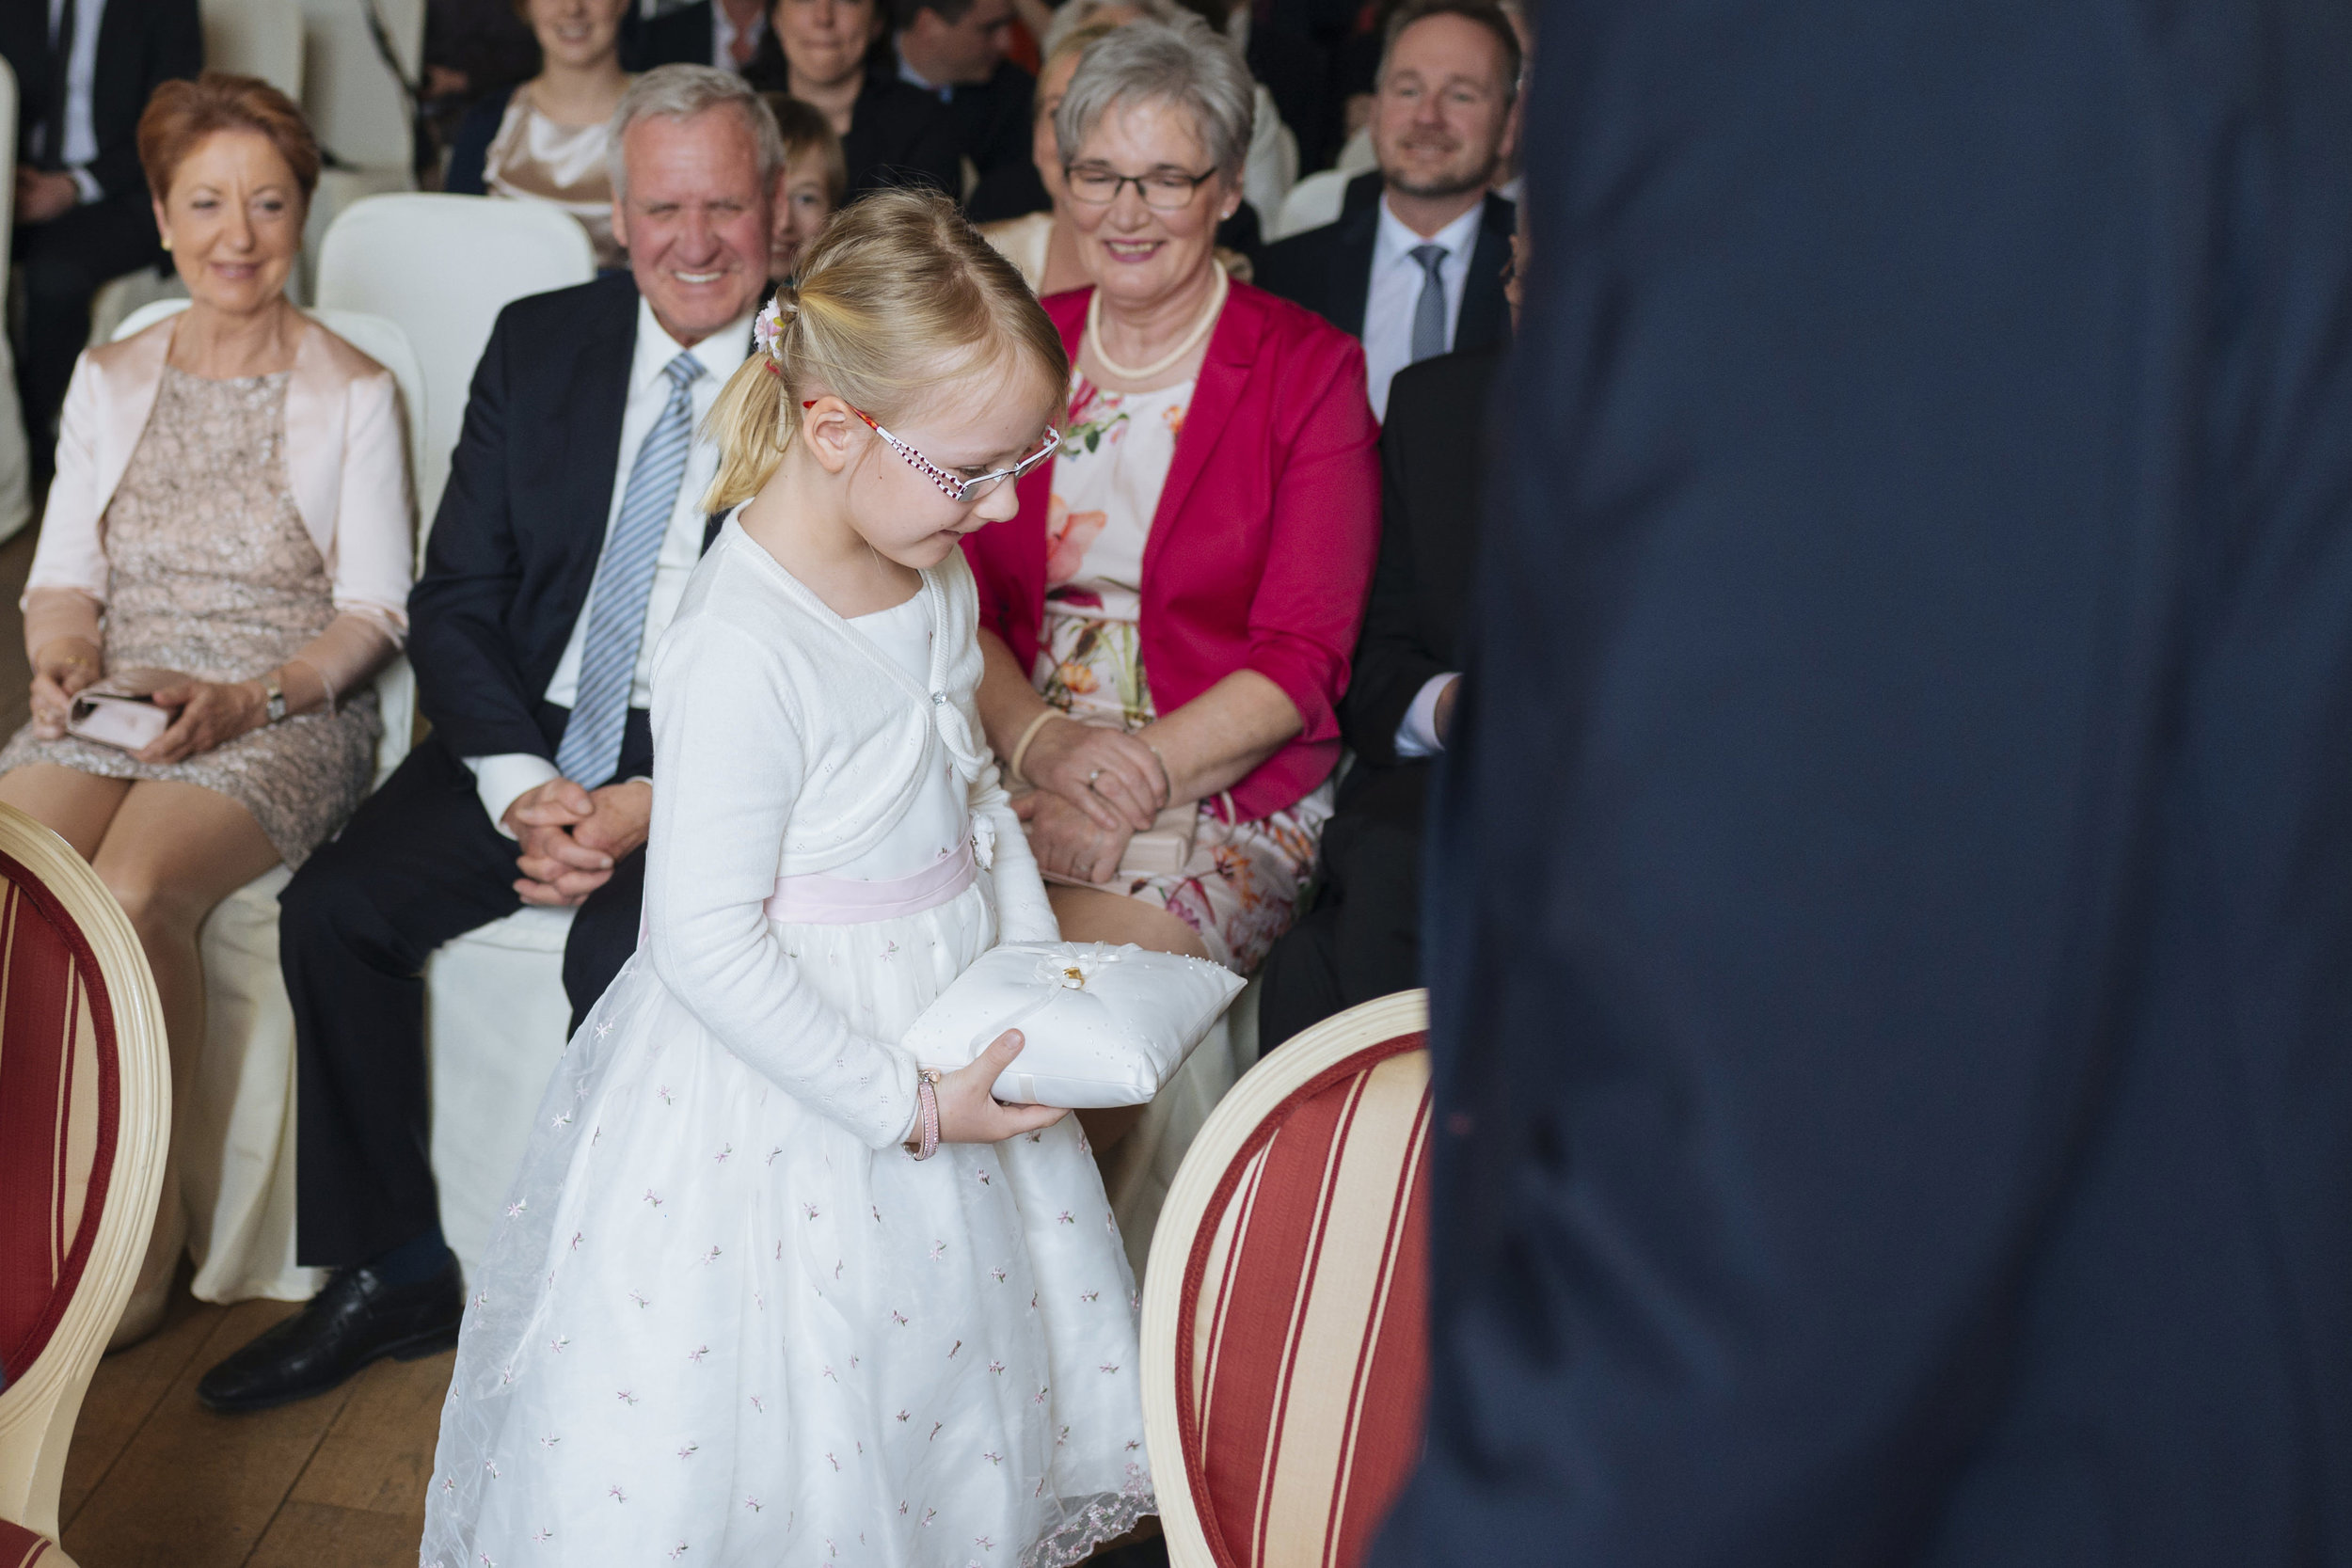 Hochzeitsfotograf-Schlossruine-Hertefeld-Weeze-075.jpg